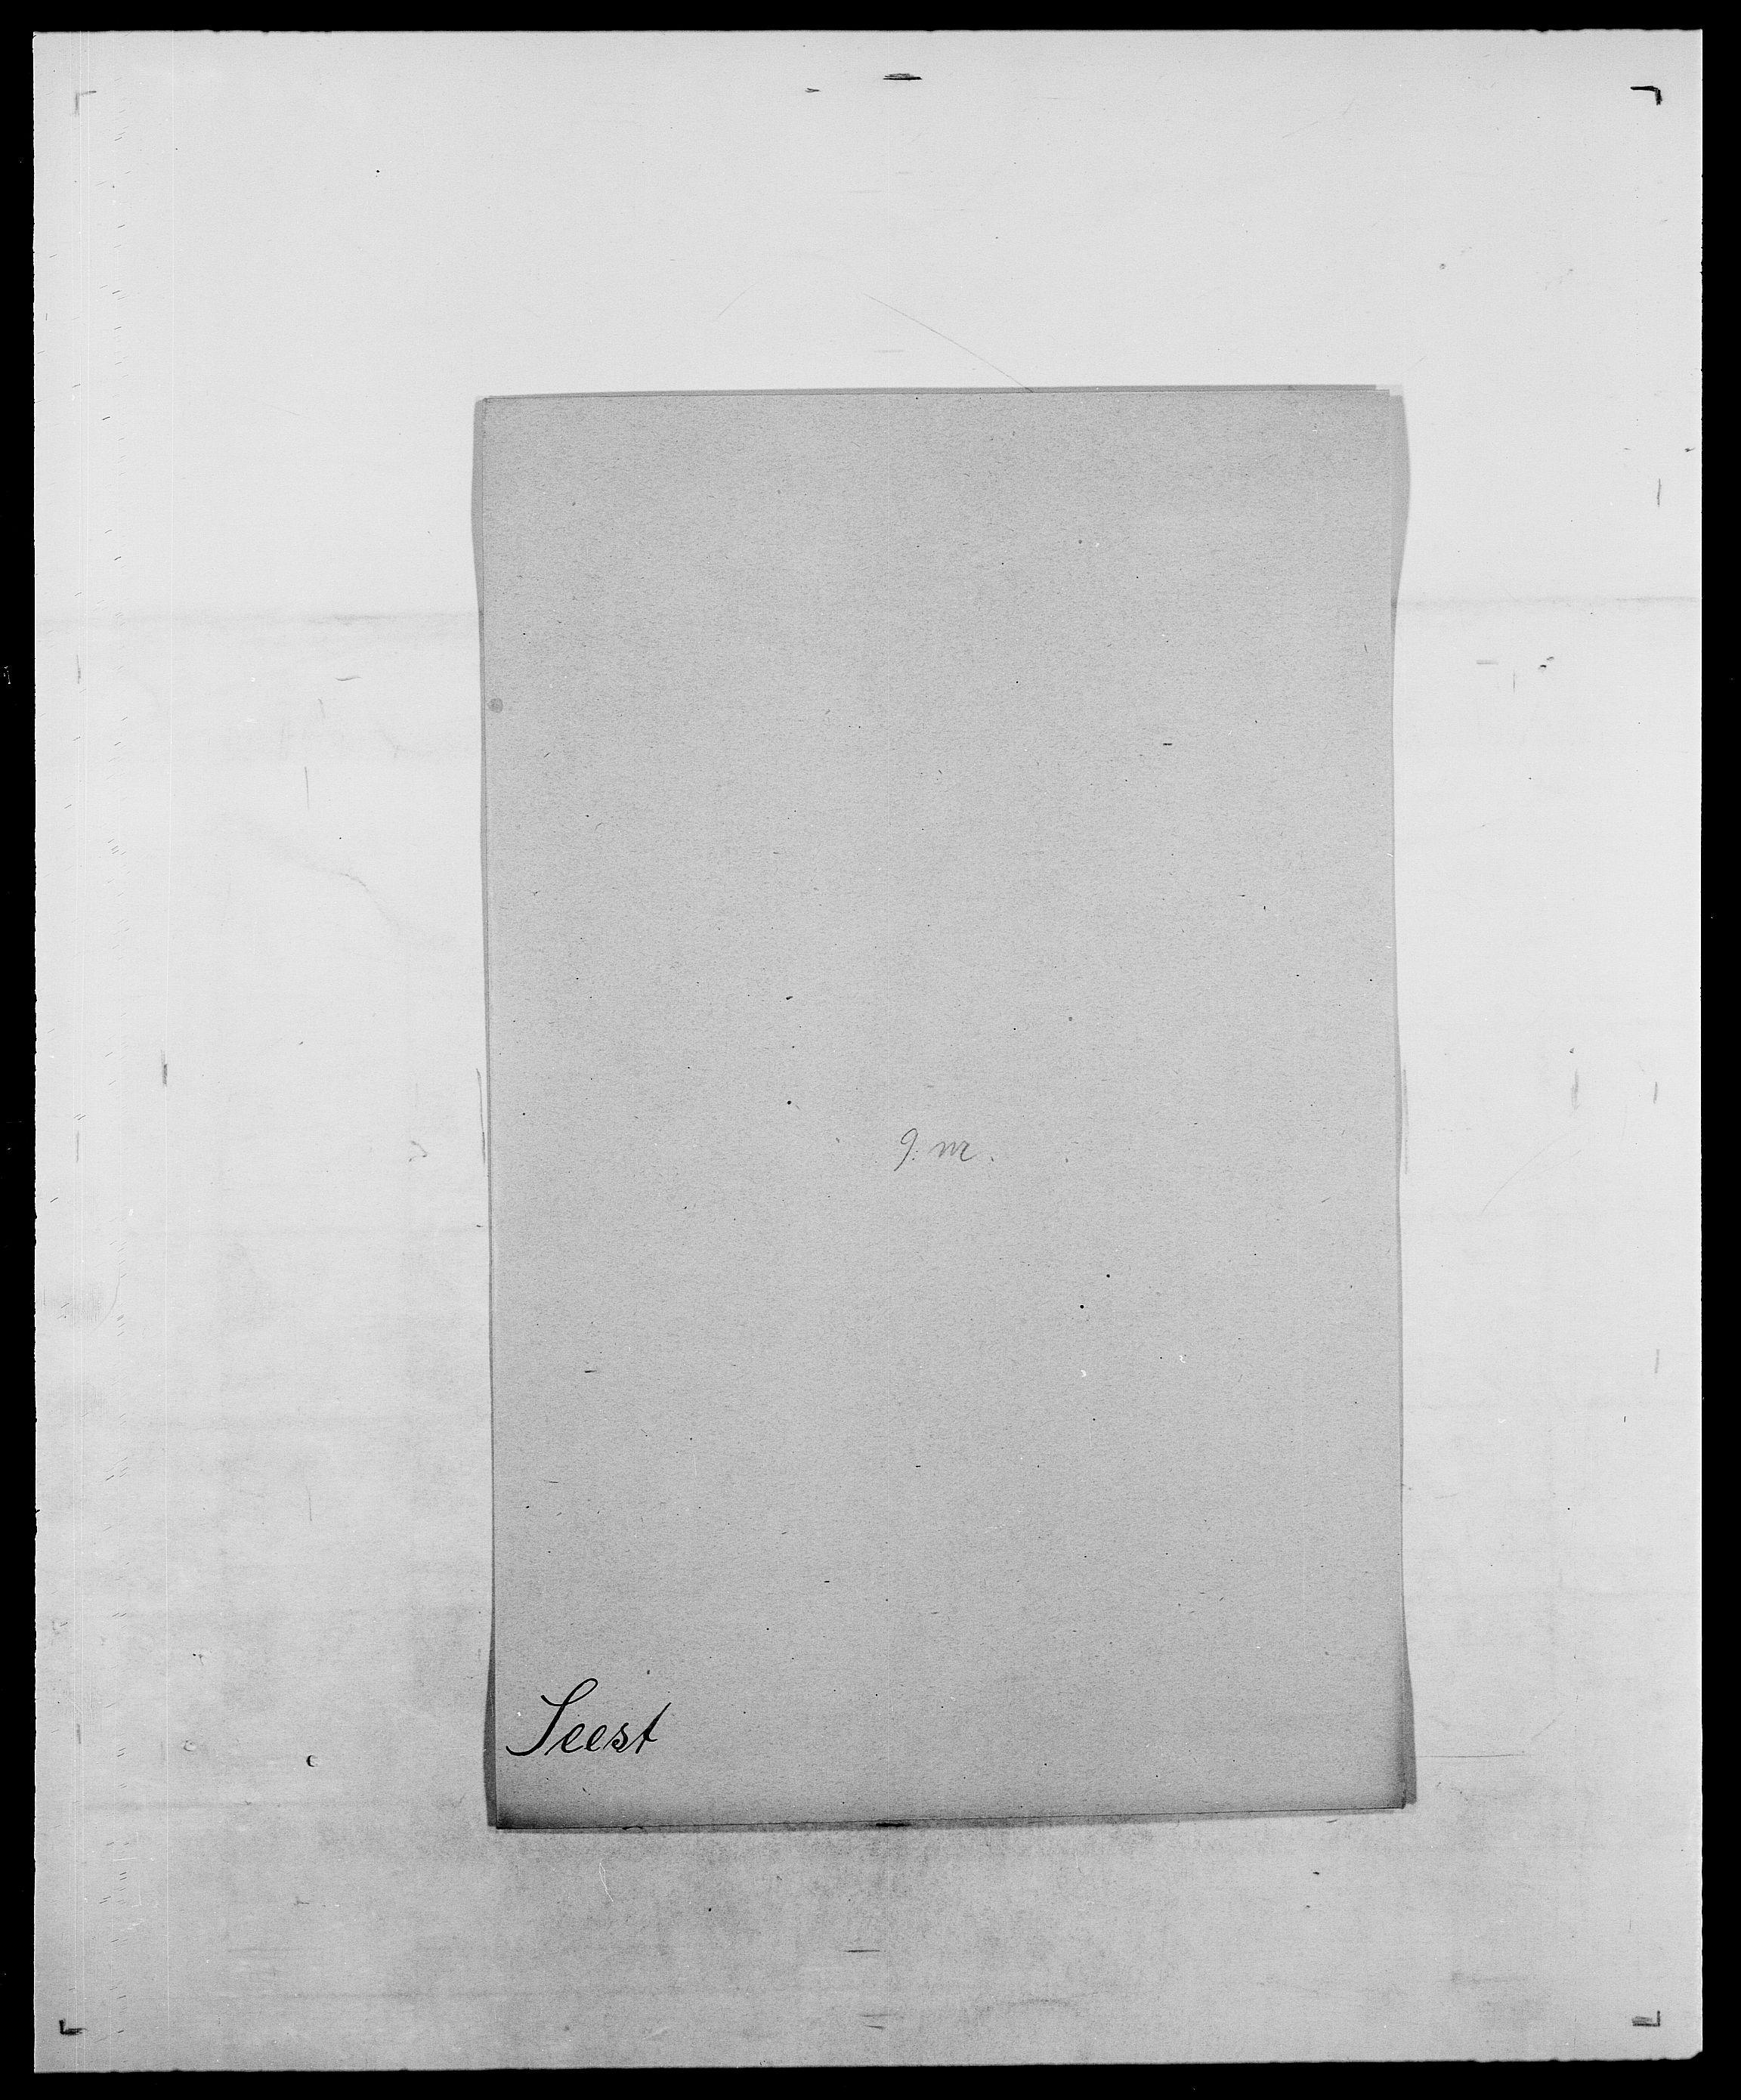 SAO, Delgobe, Charles Antoine - samling, D/Da/L0035: Schnabel - sjetman, s. 564